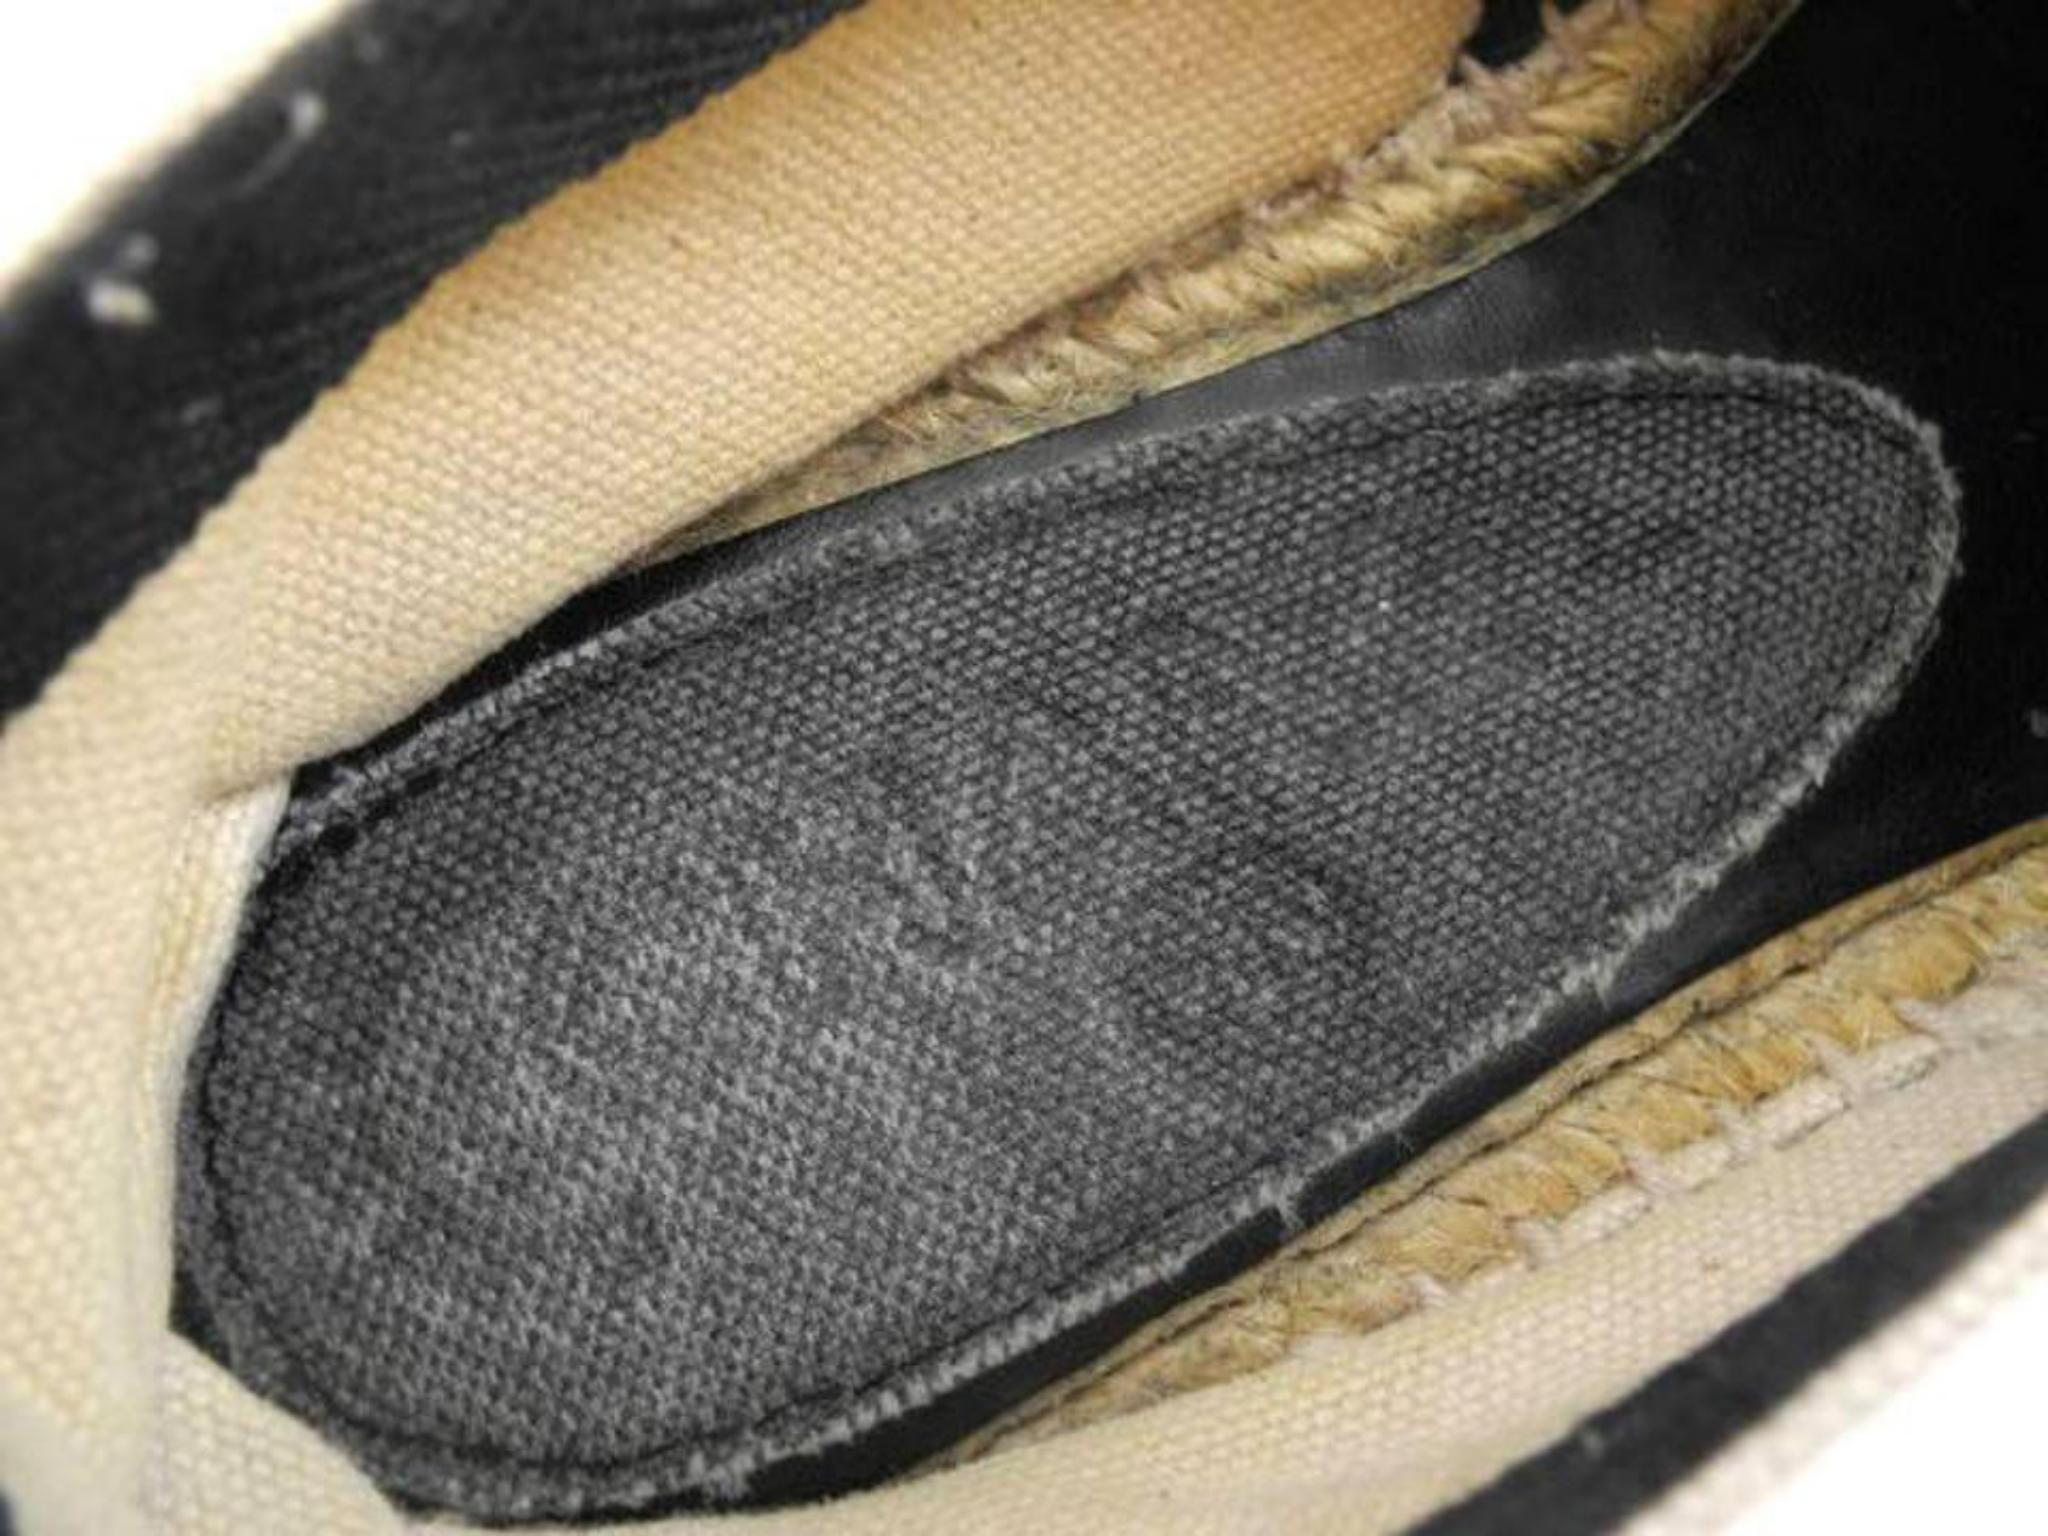 d3ccd1b00968 Chanel Beige X Black Cc Logo Espadrilles 224606 Flats For Sale at 1stdibs